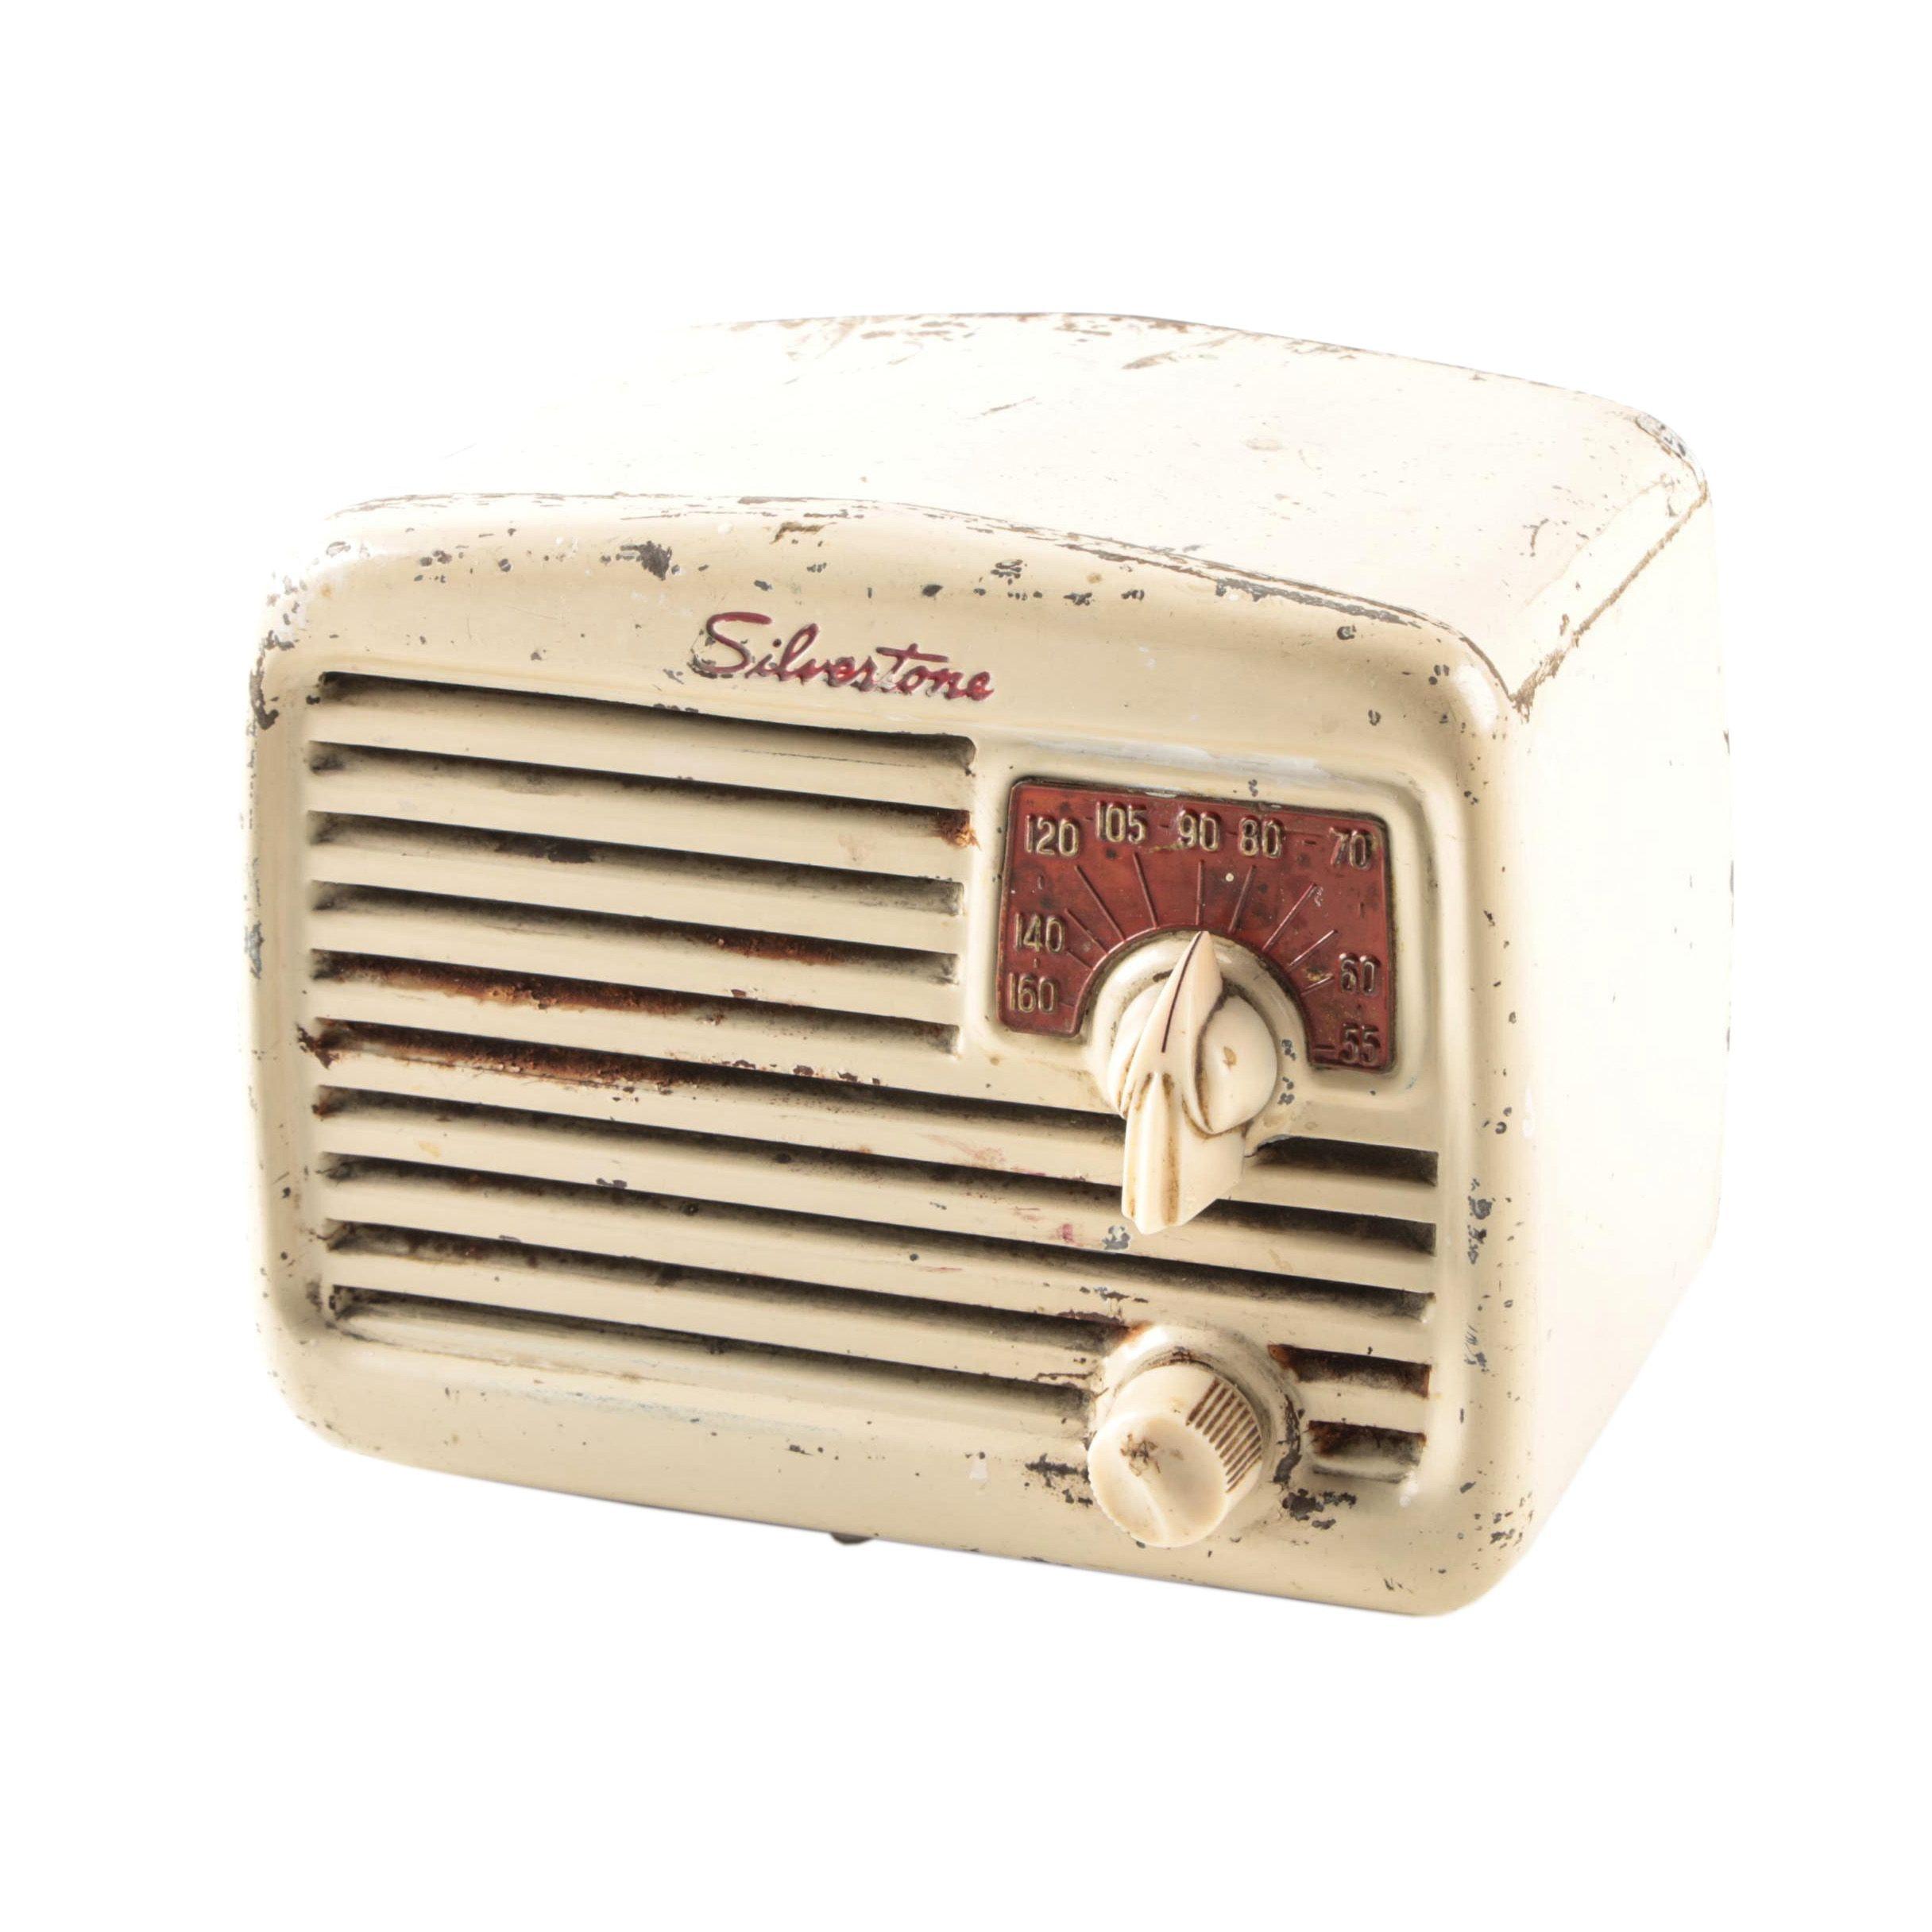 1946 Silvertone 6002 Radio